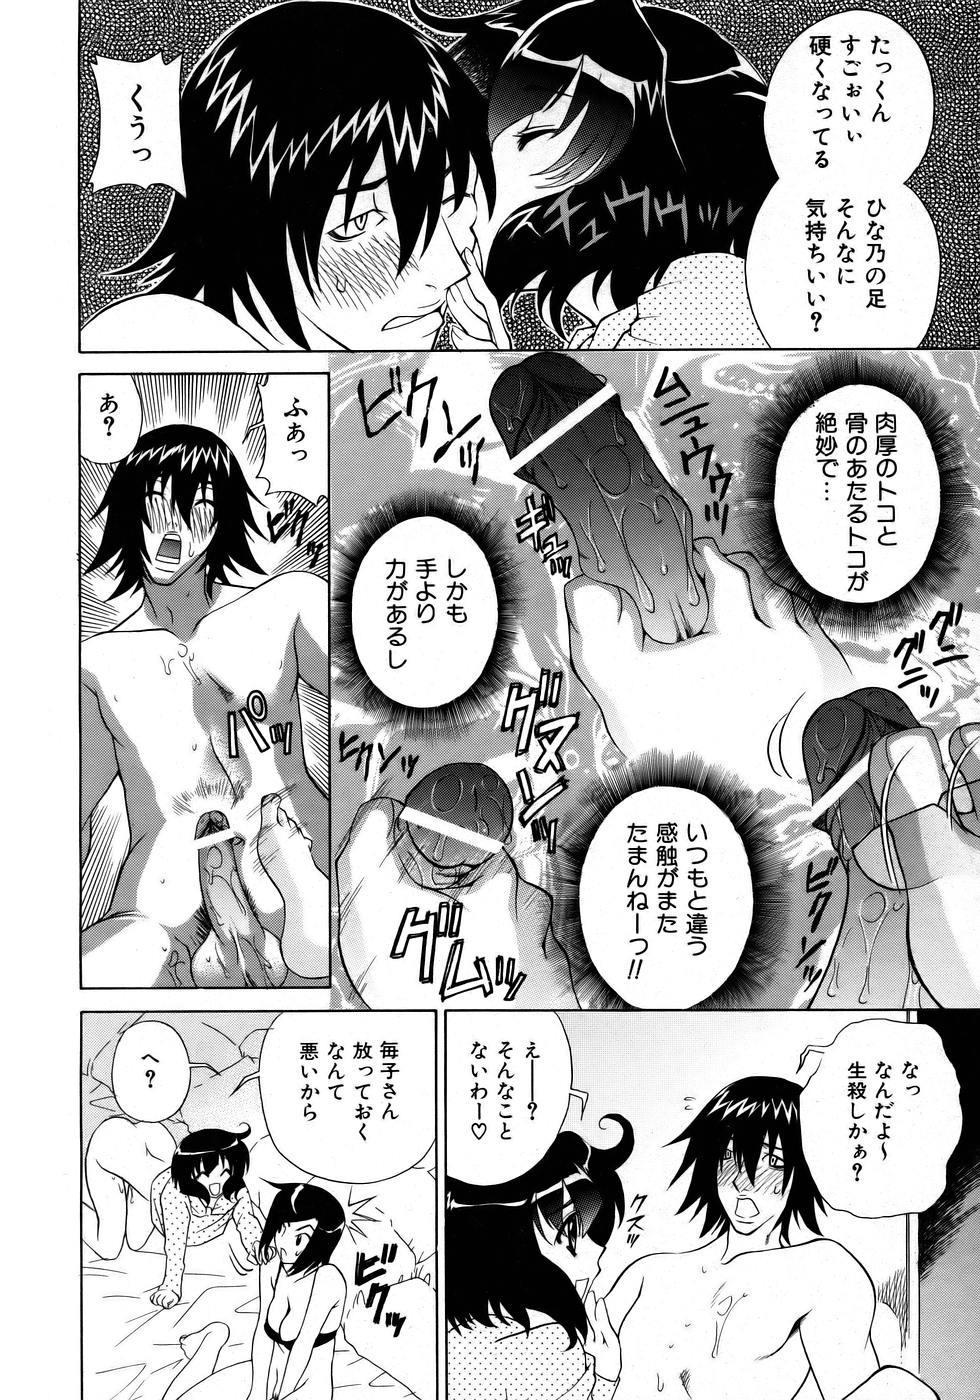 COMIC AUN 2005-12 Vol. 115 325